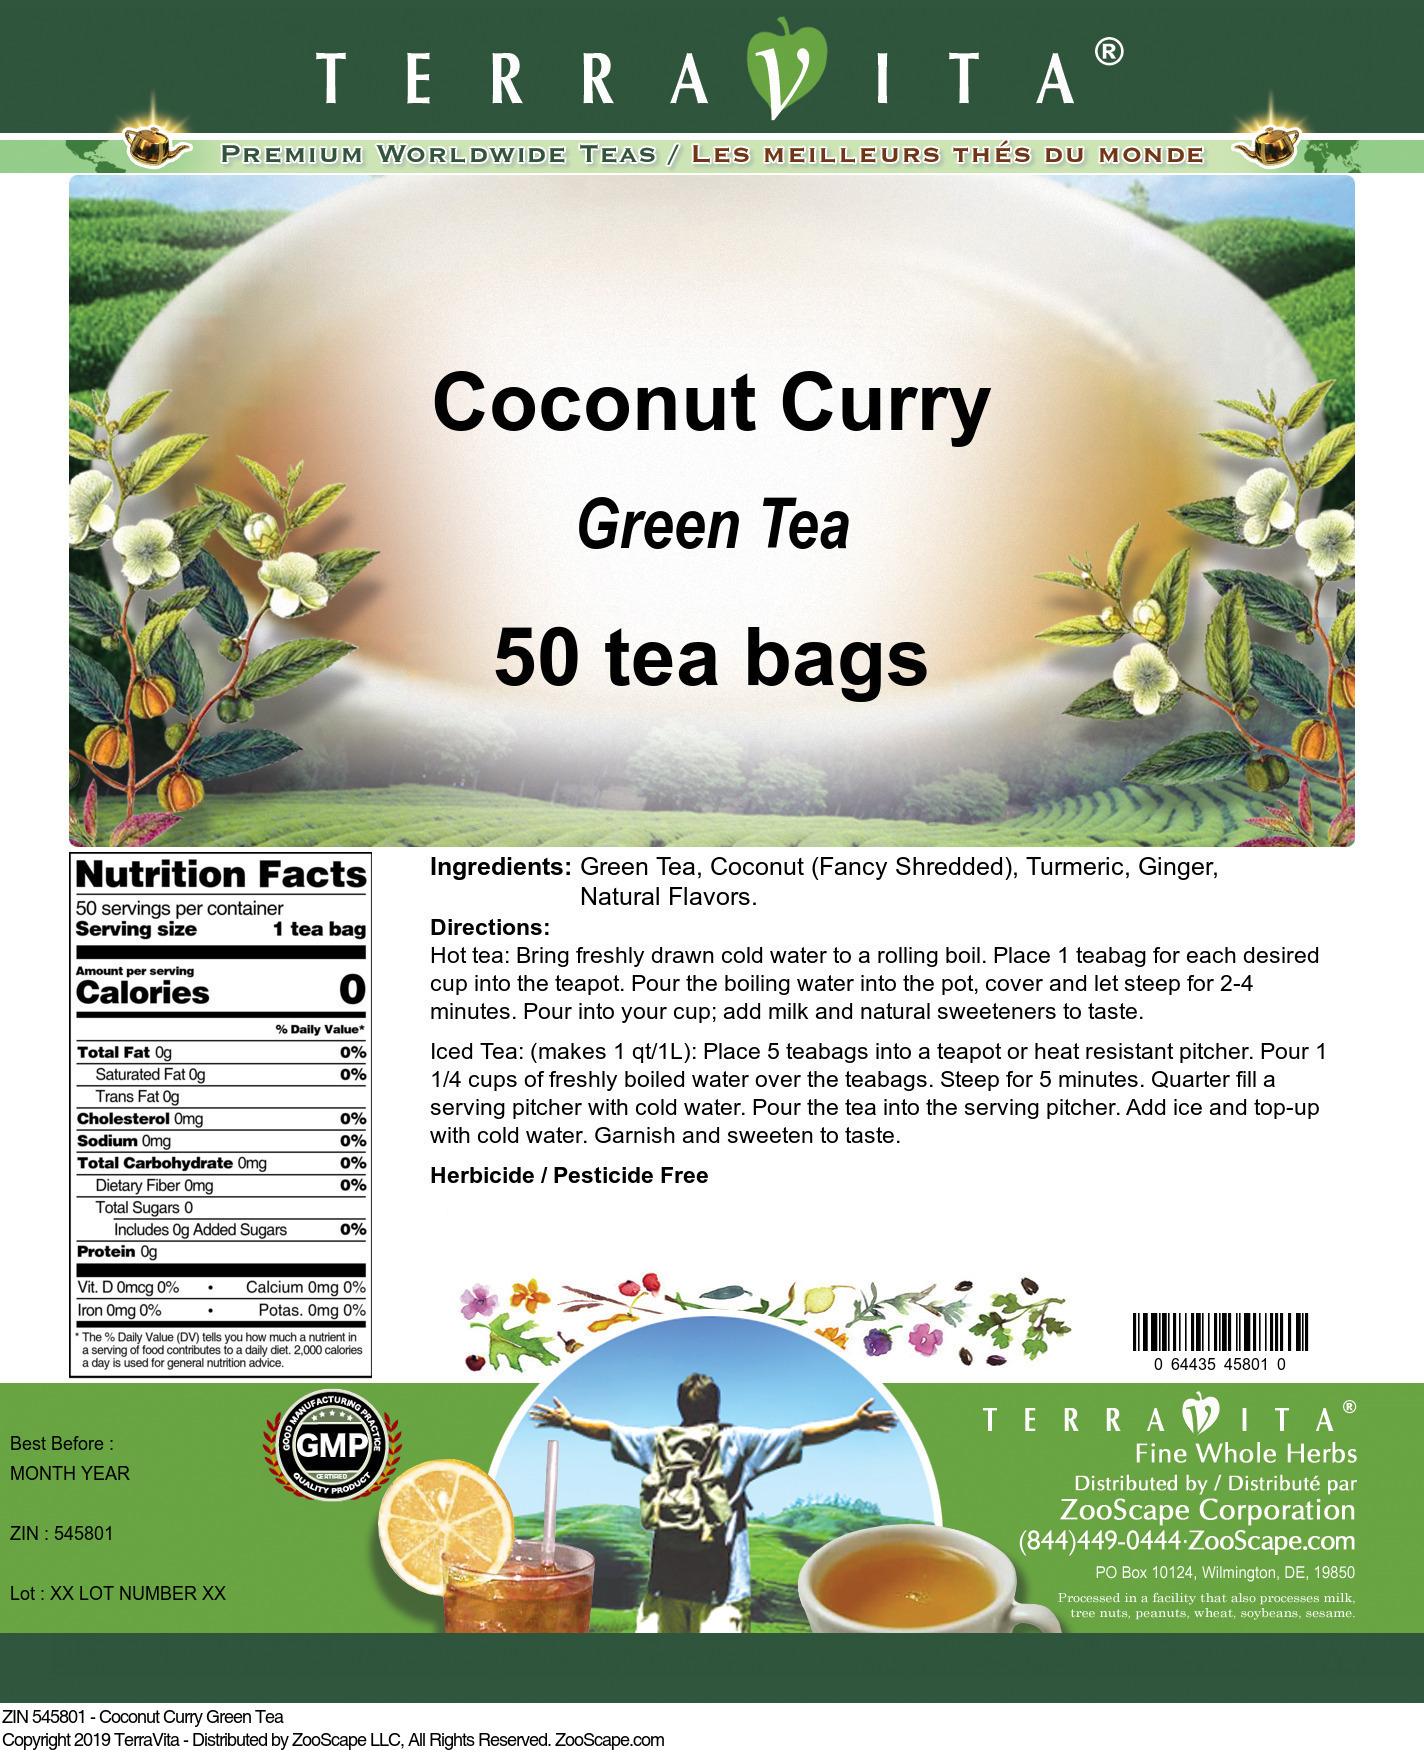 Coconut Curry Green Tea